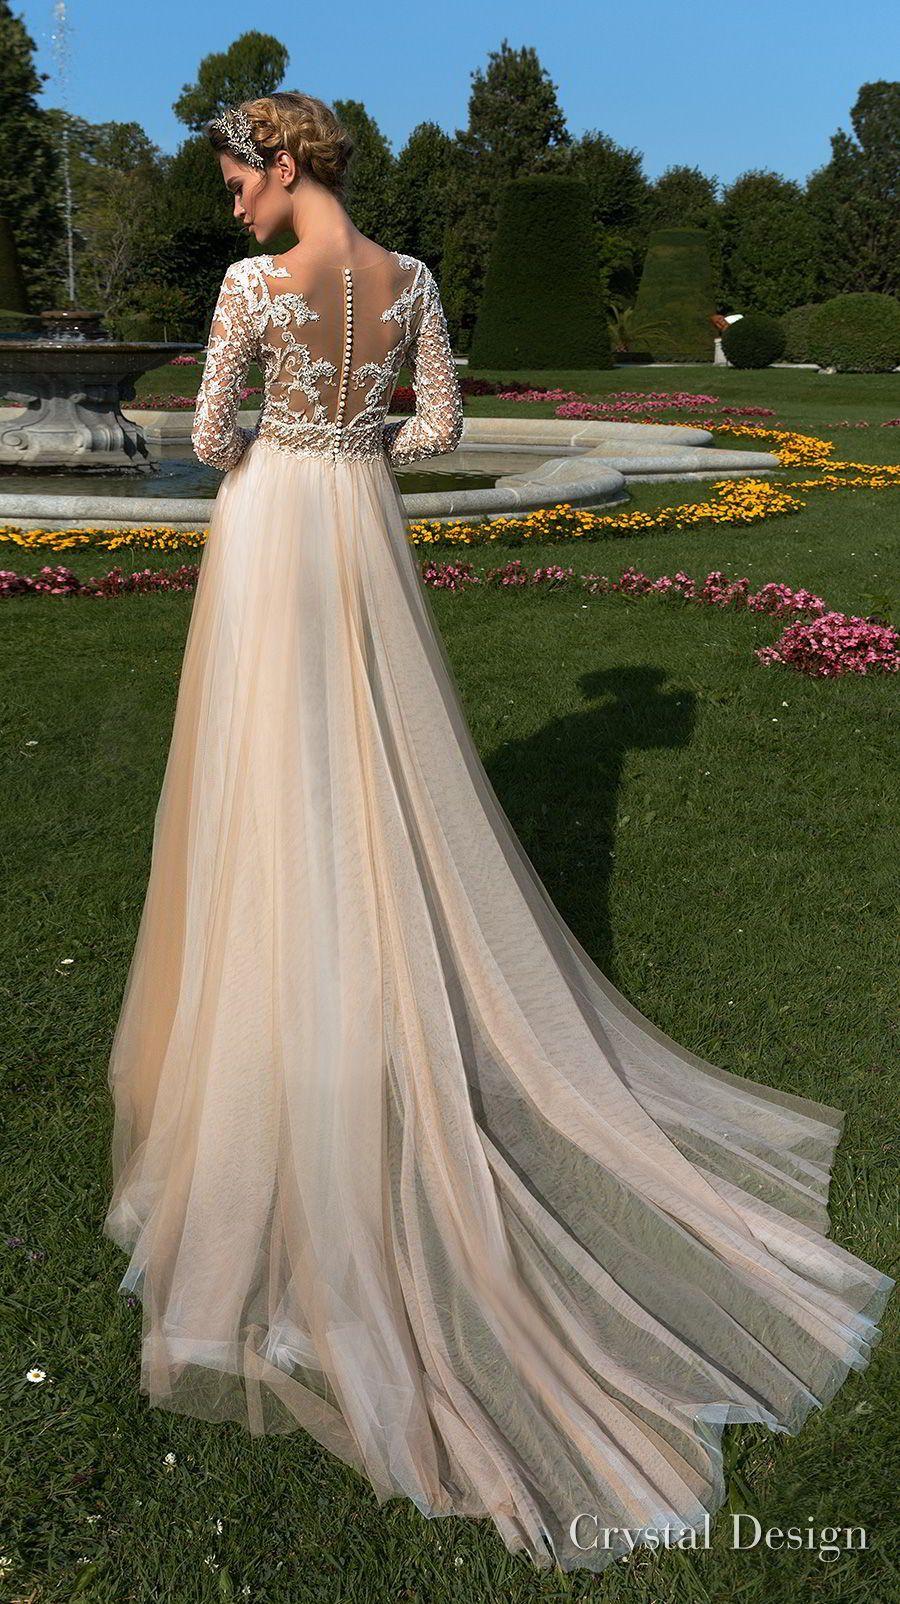 Champagne colored wedding dress  crystal design  long sleeves v neck heavily embellished bodice